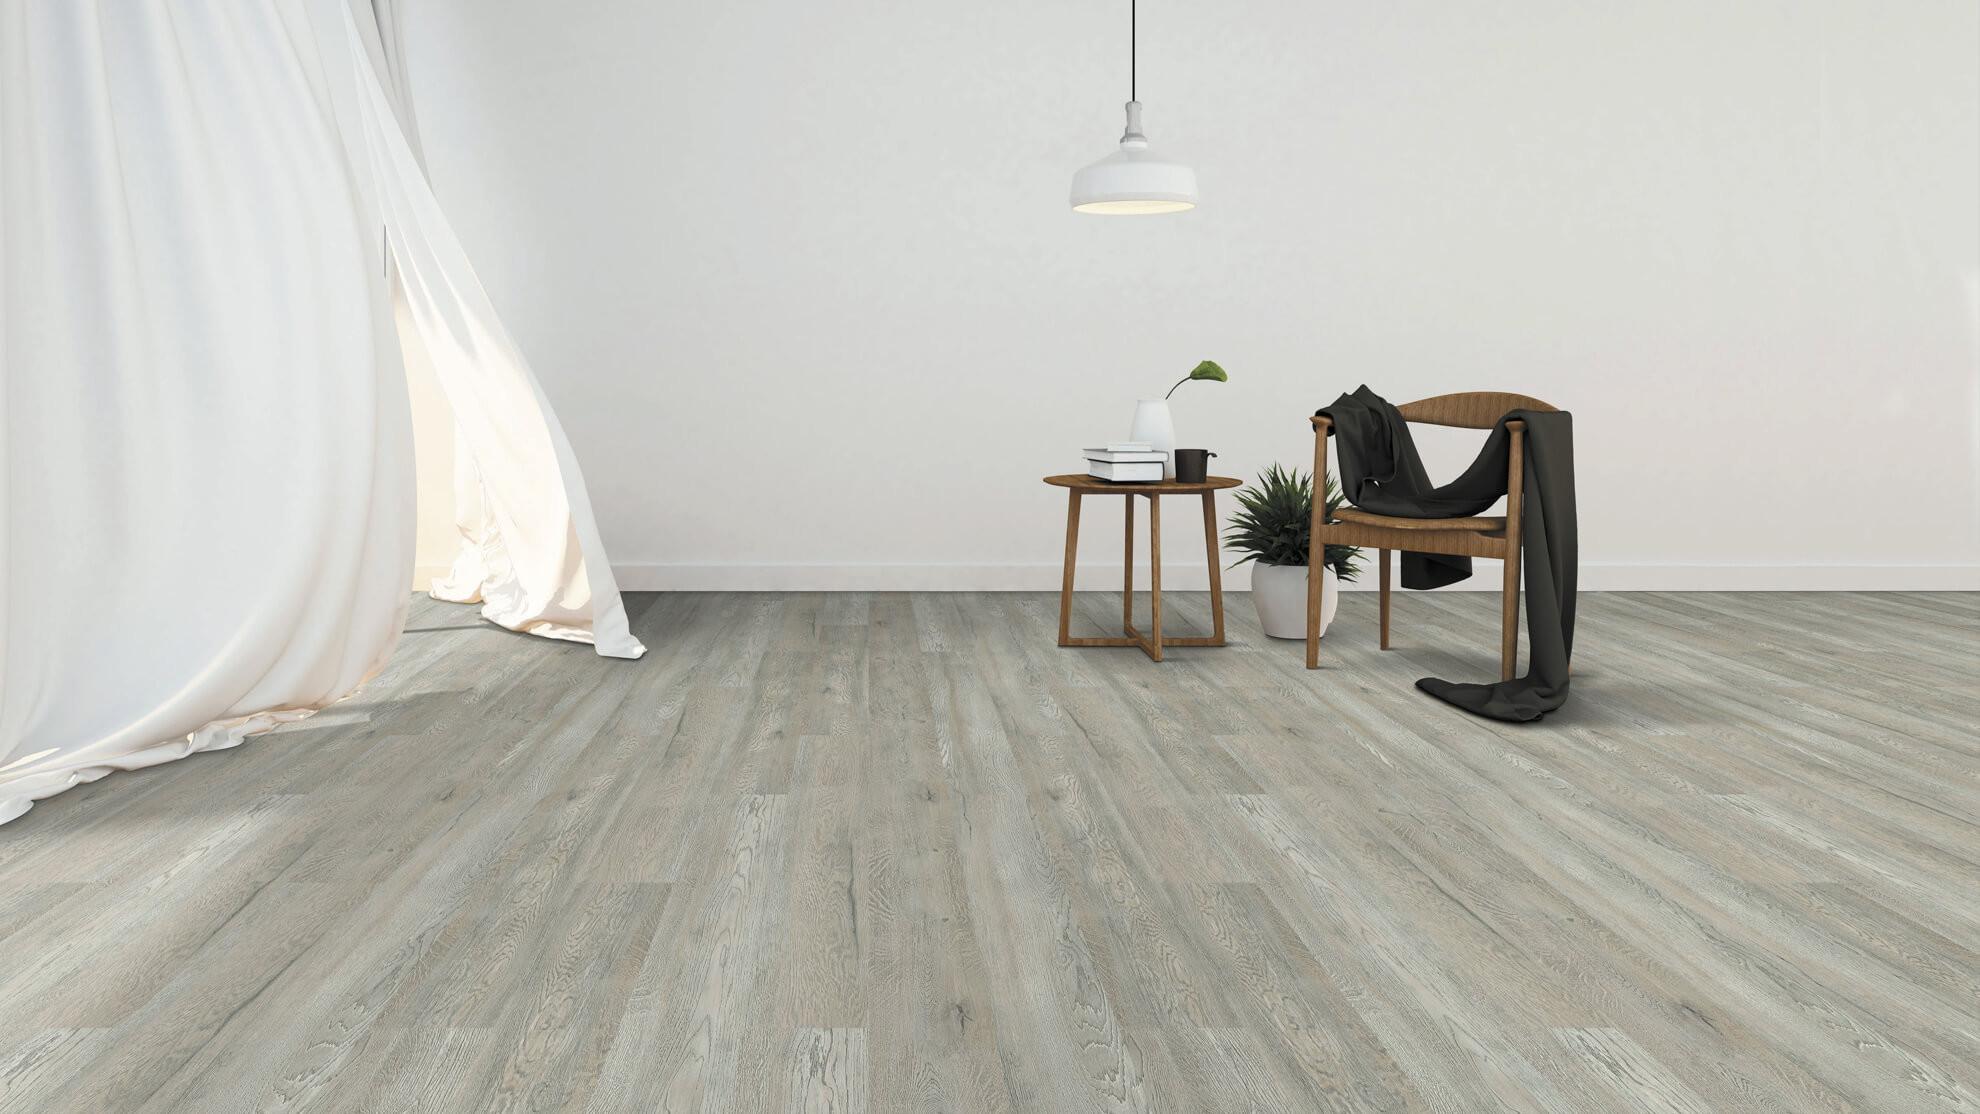 30 Lovely Timberland Hardwood Floors Omaha 2021 free download timberland hardwood floors omaha of earthwerks flooring with regard to noble classic plus alaska oak ncr 9708